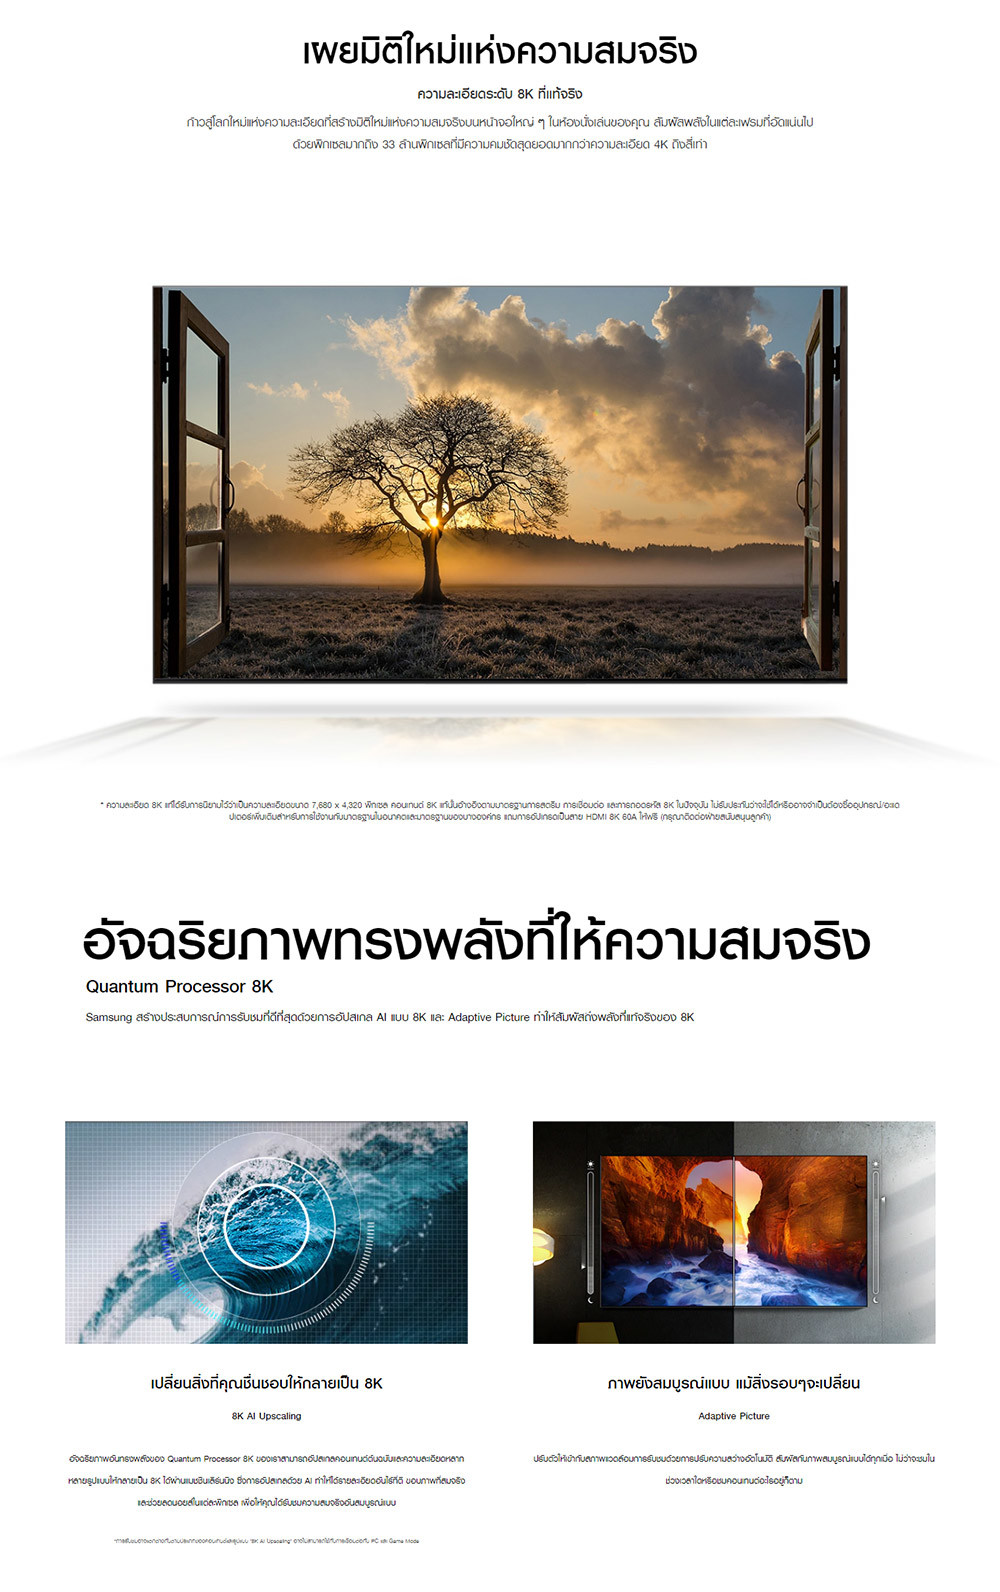 content-image_2.jpg